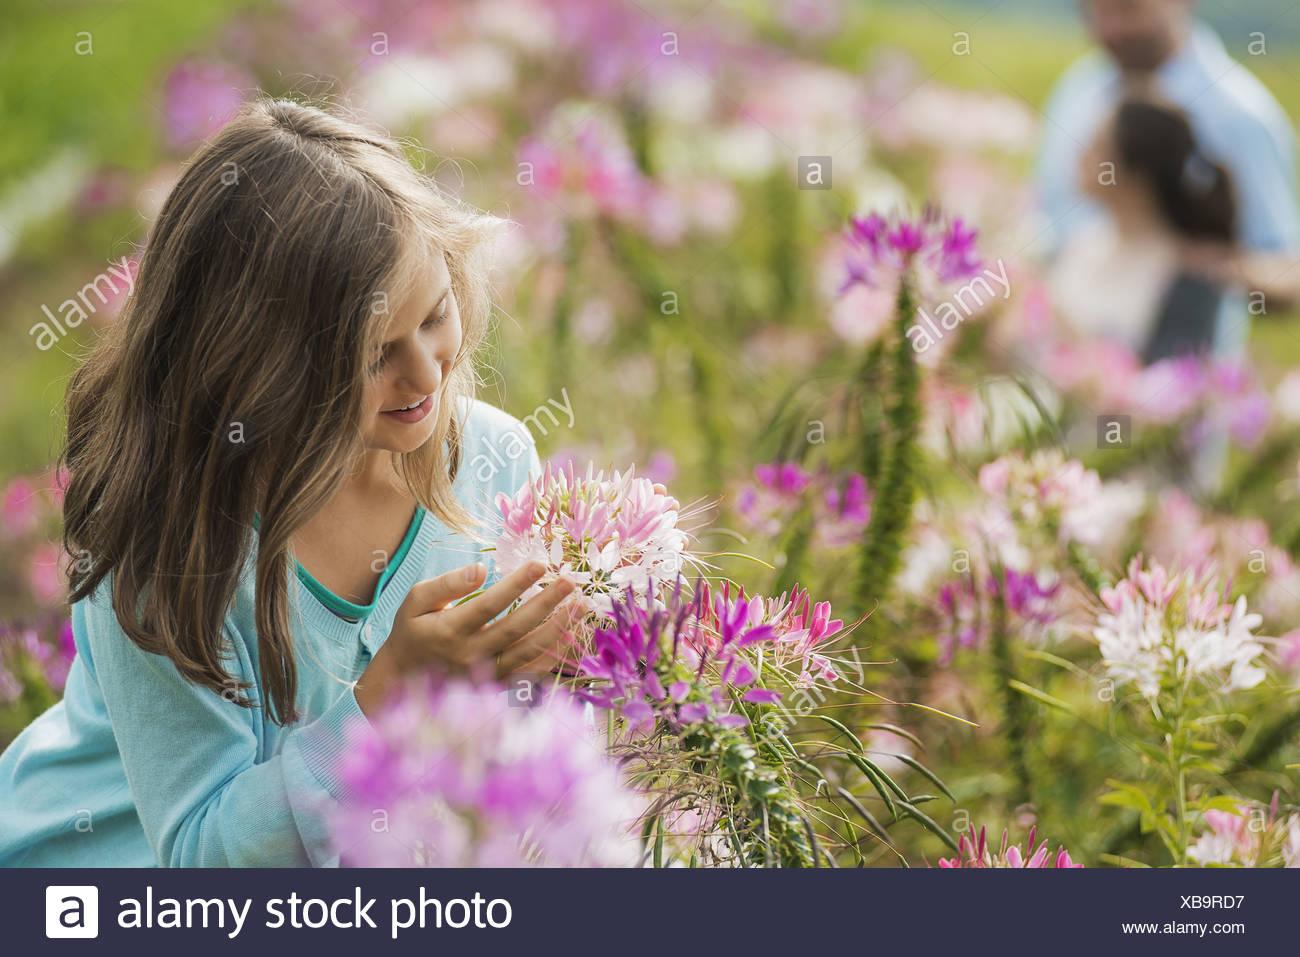 Woodstock New York USA Three people among the flowers organic Flower Farm - Stock Image